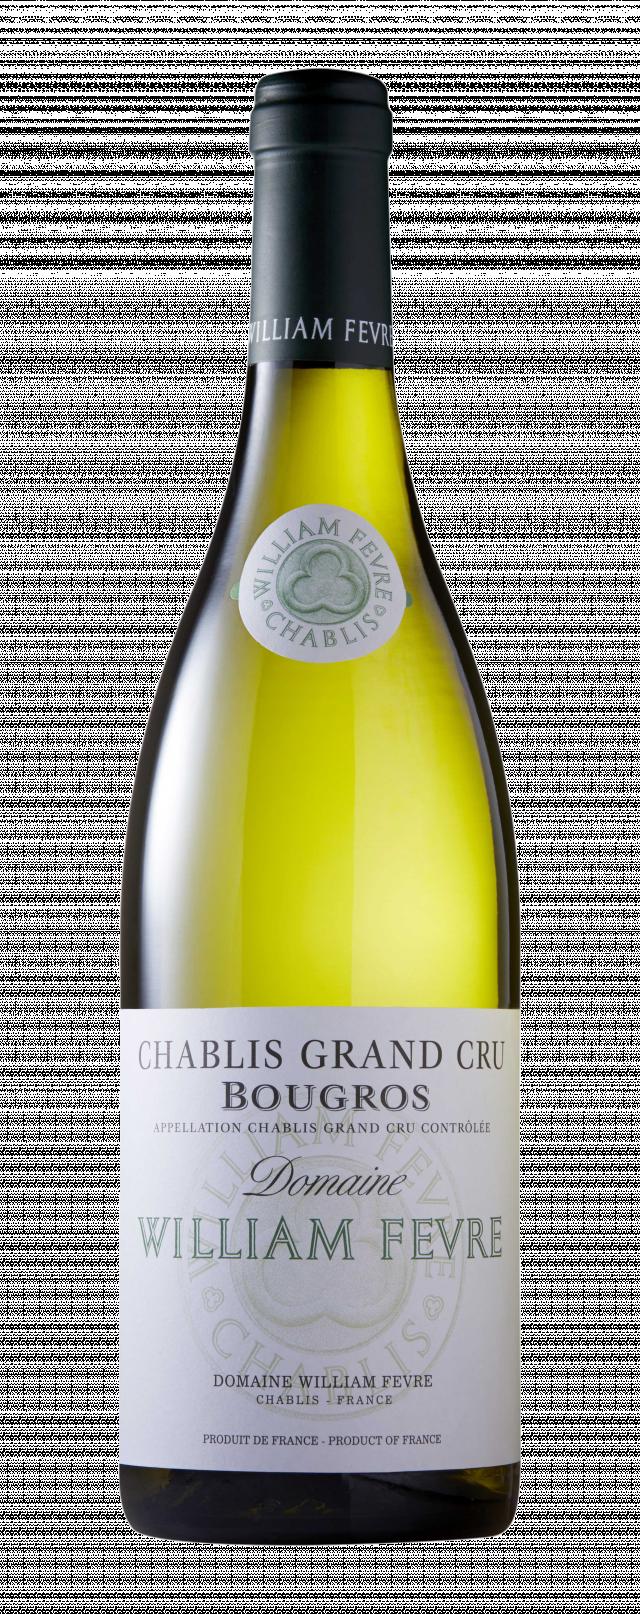 Chablis Grand Cru Bougros Domaine